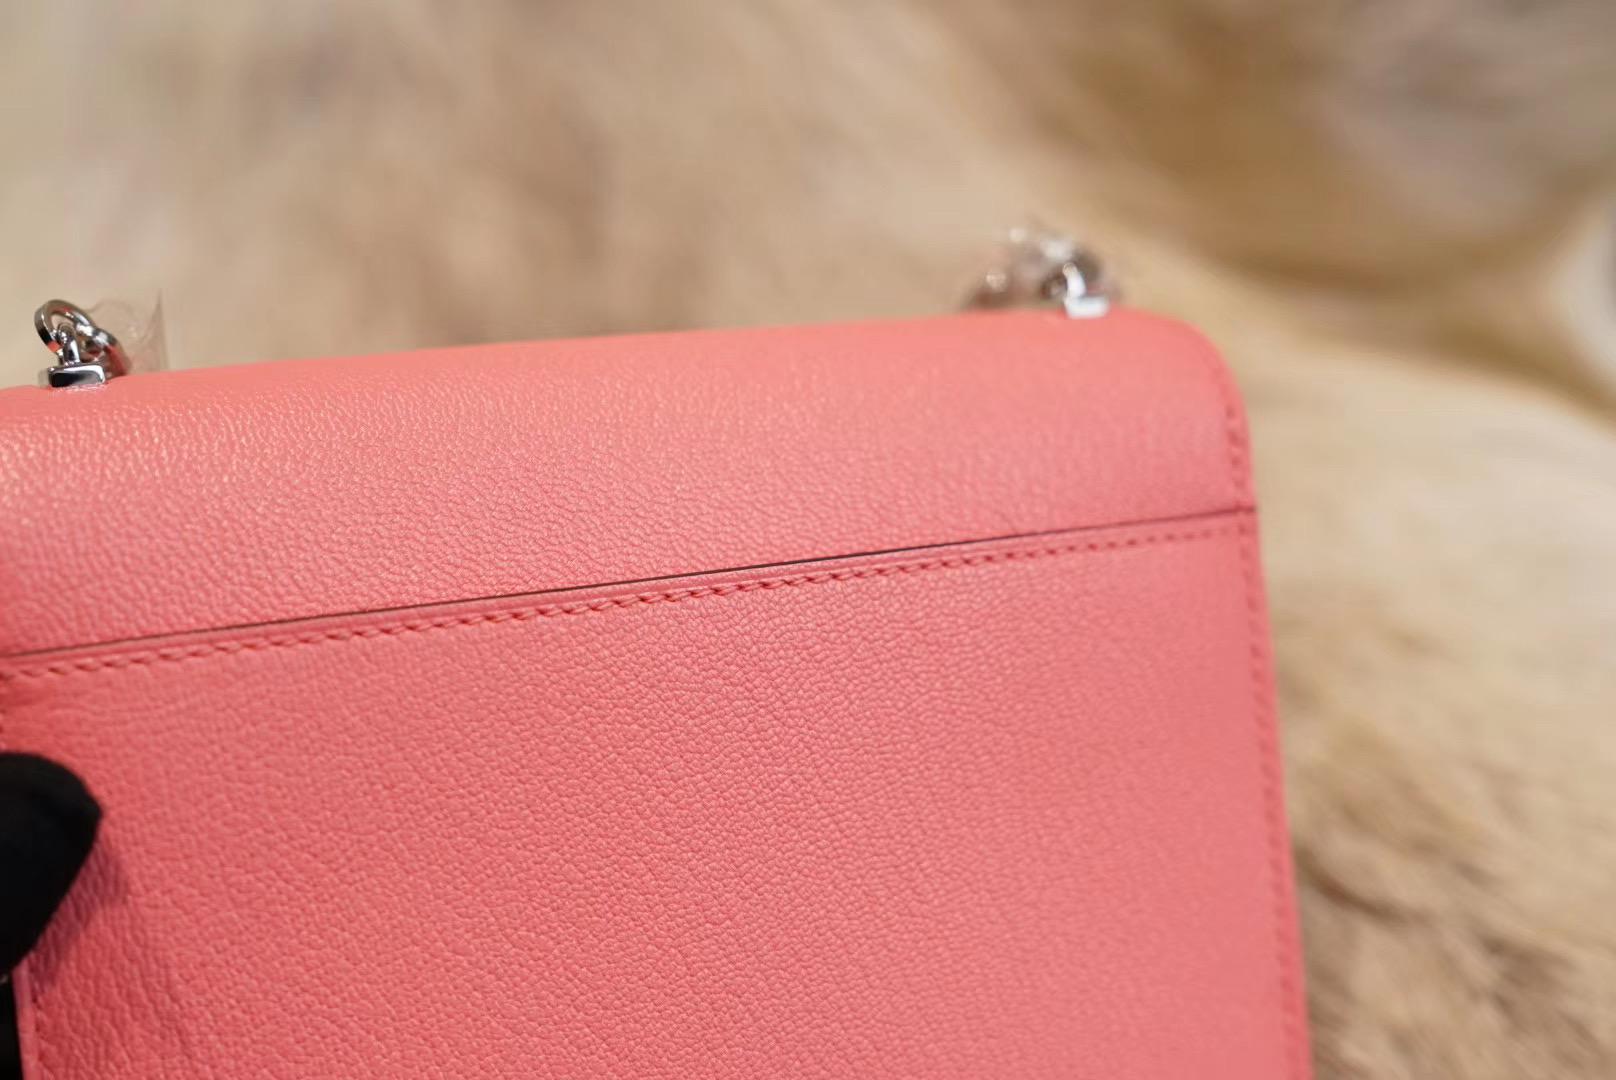 Roulis K4夏日玫瑰粉 Verrou Mini 原厂山羊皮 法国蜡线 全手缝